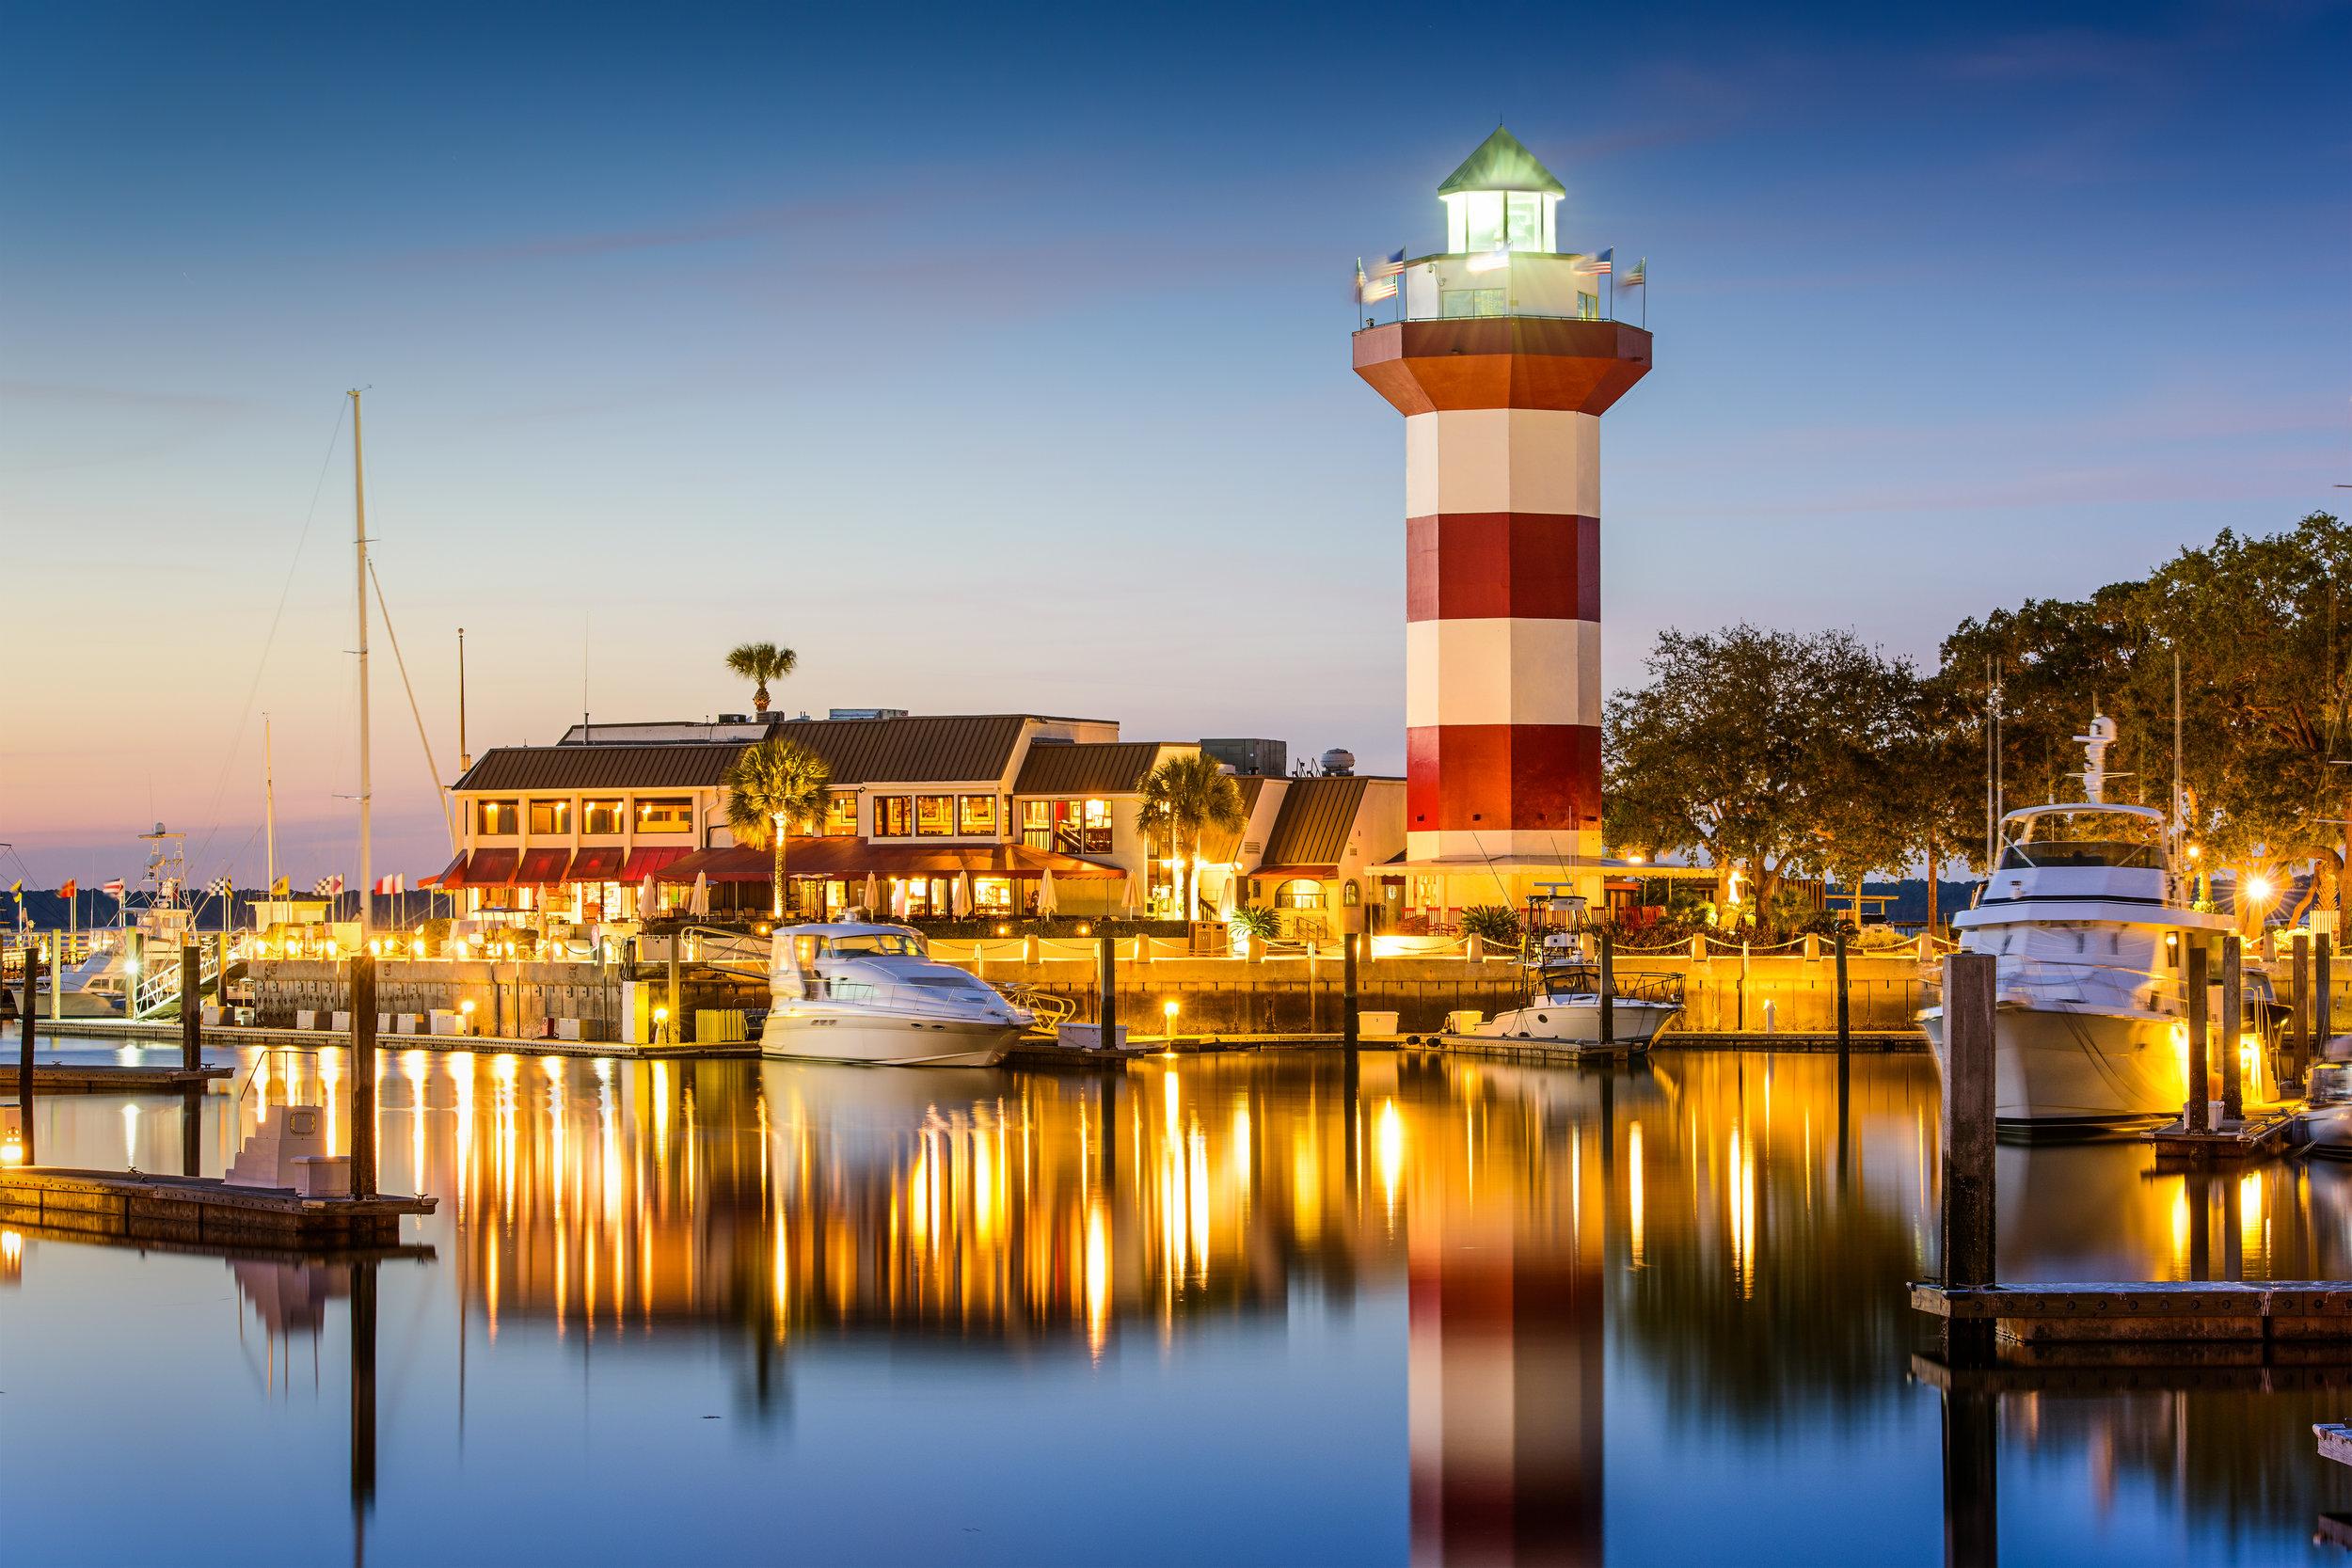 sea-pines-lighthouse.jpg